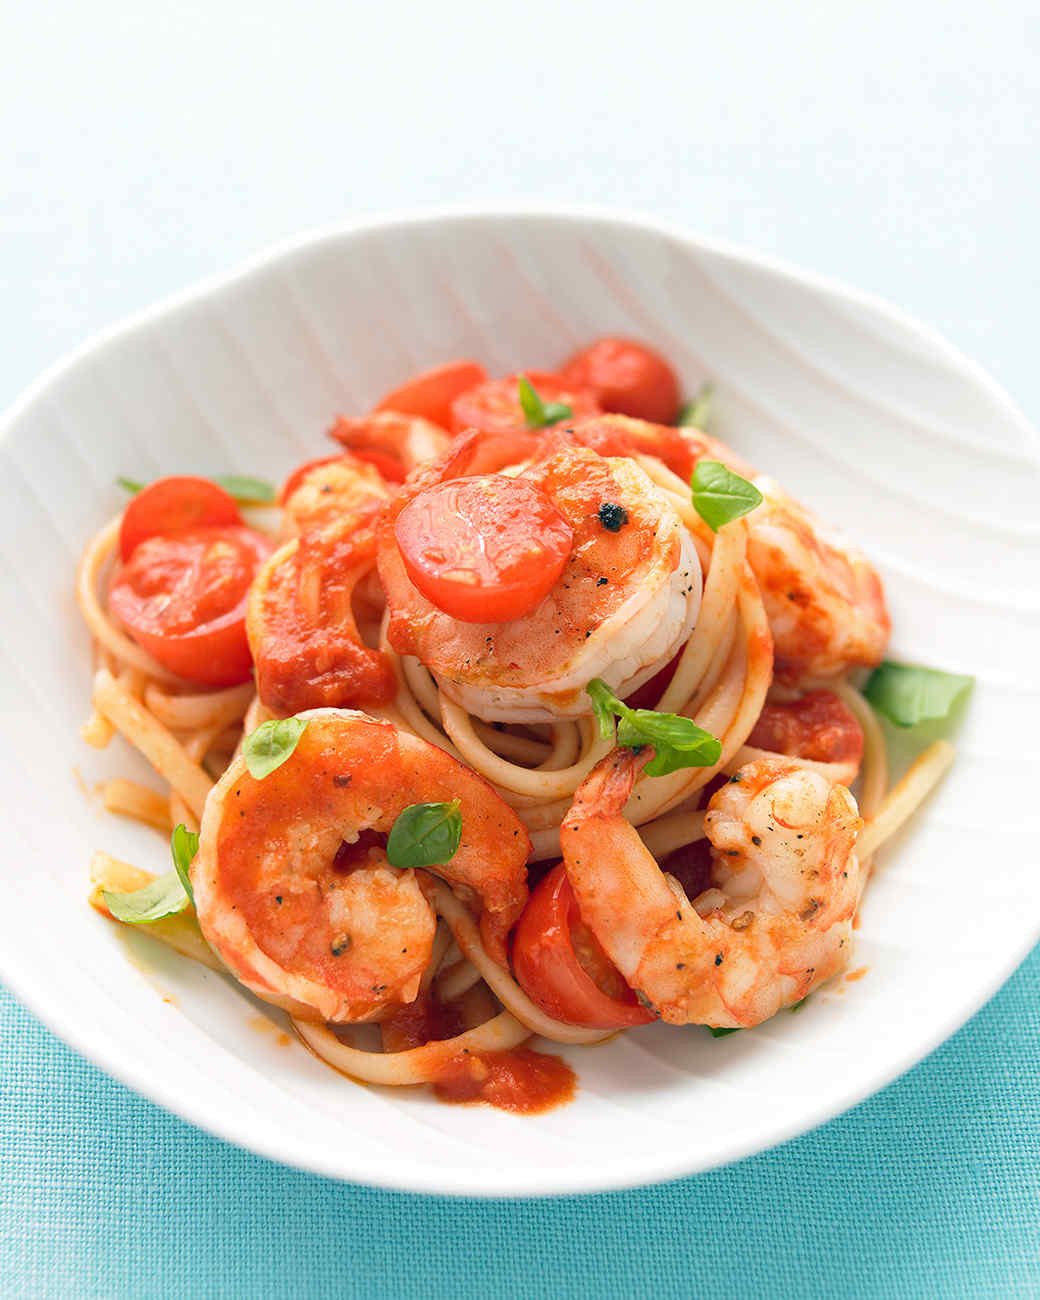 Shrimp Recipes With Pasta  Shrimp Tomato and Basil Pasta